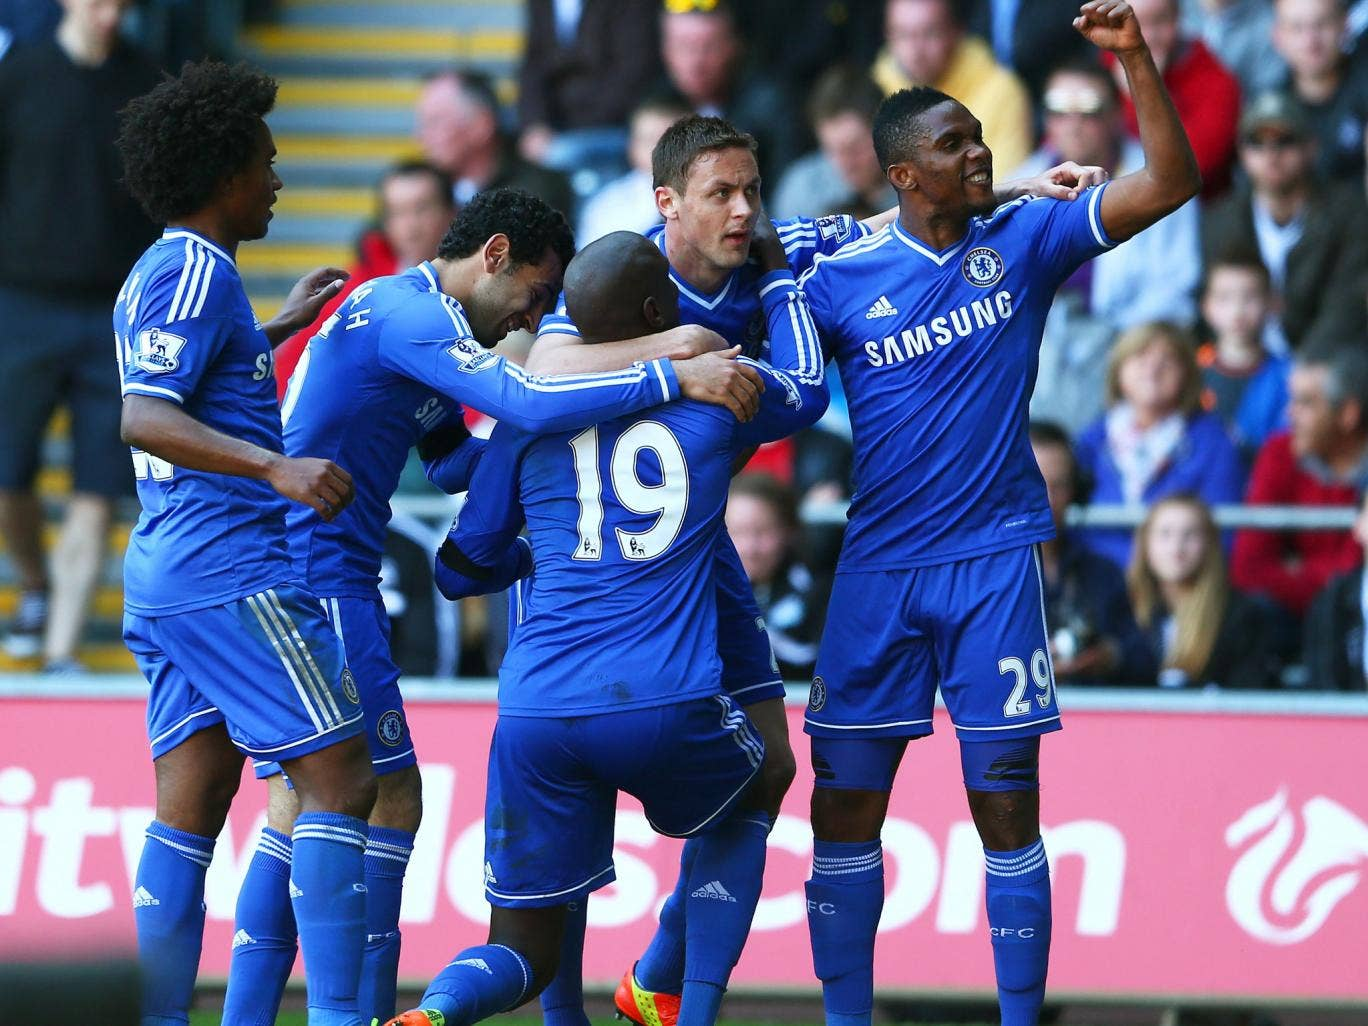 Demba Ba (centre) celebrates his winning goal with Chelsea team-mates